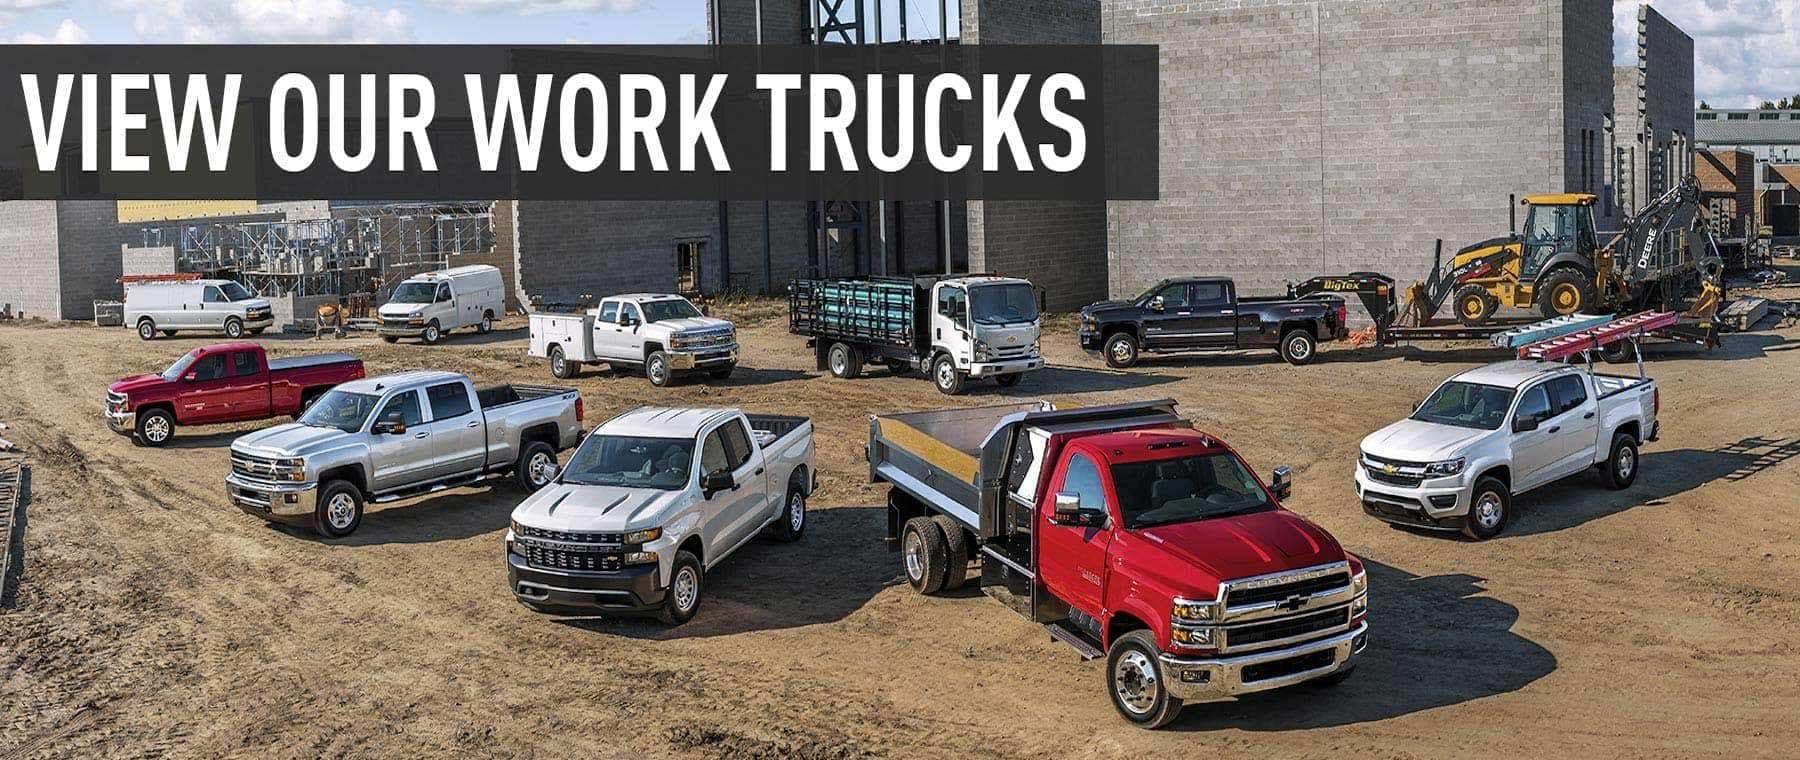 Chevy-Work-Trucks-1-1800×760